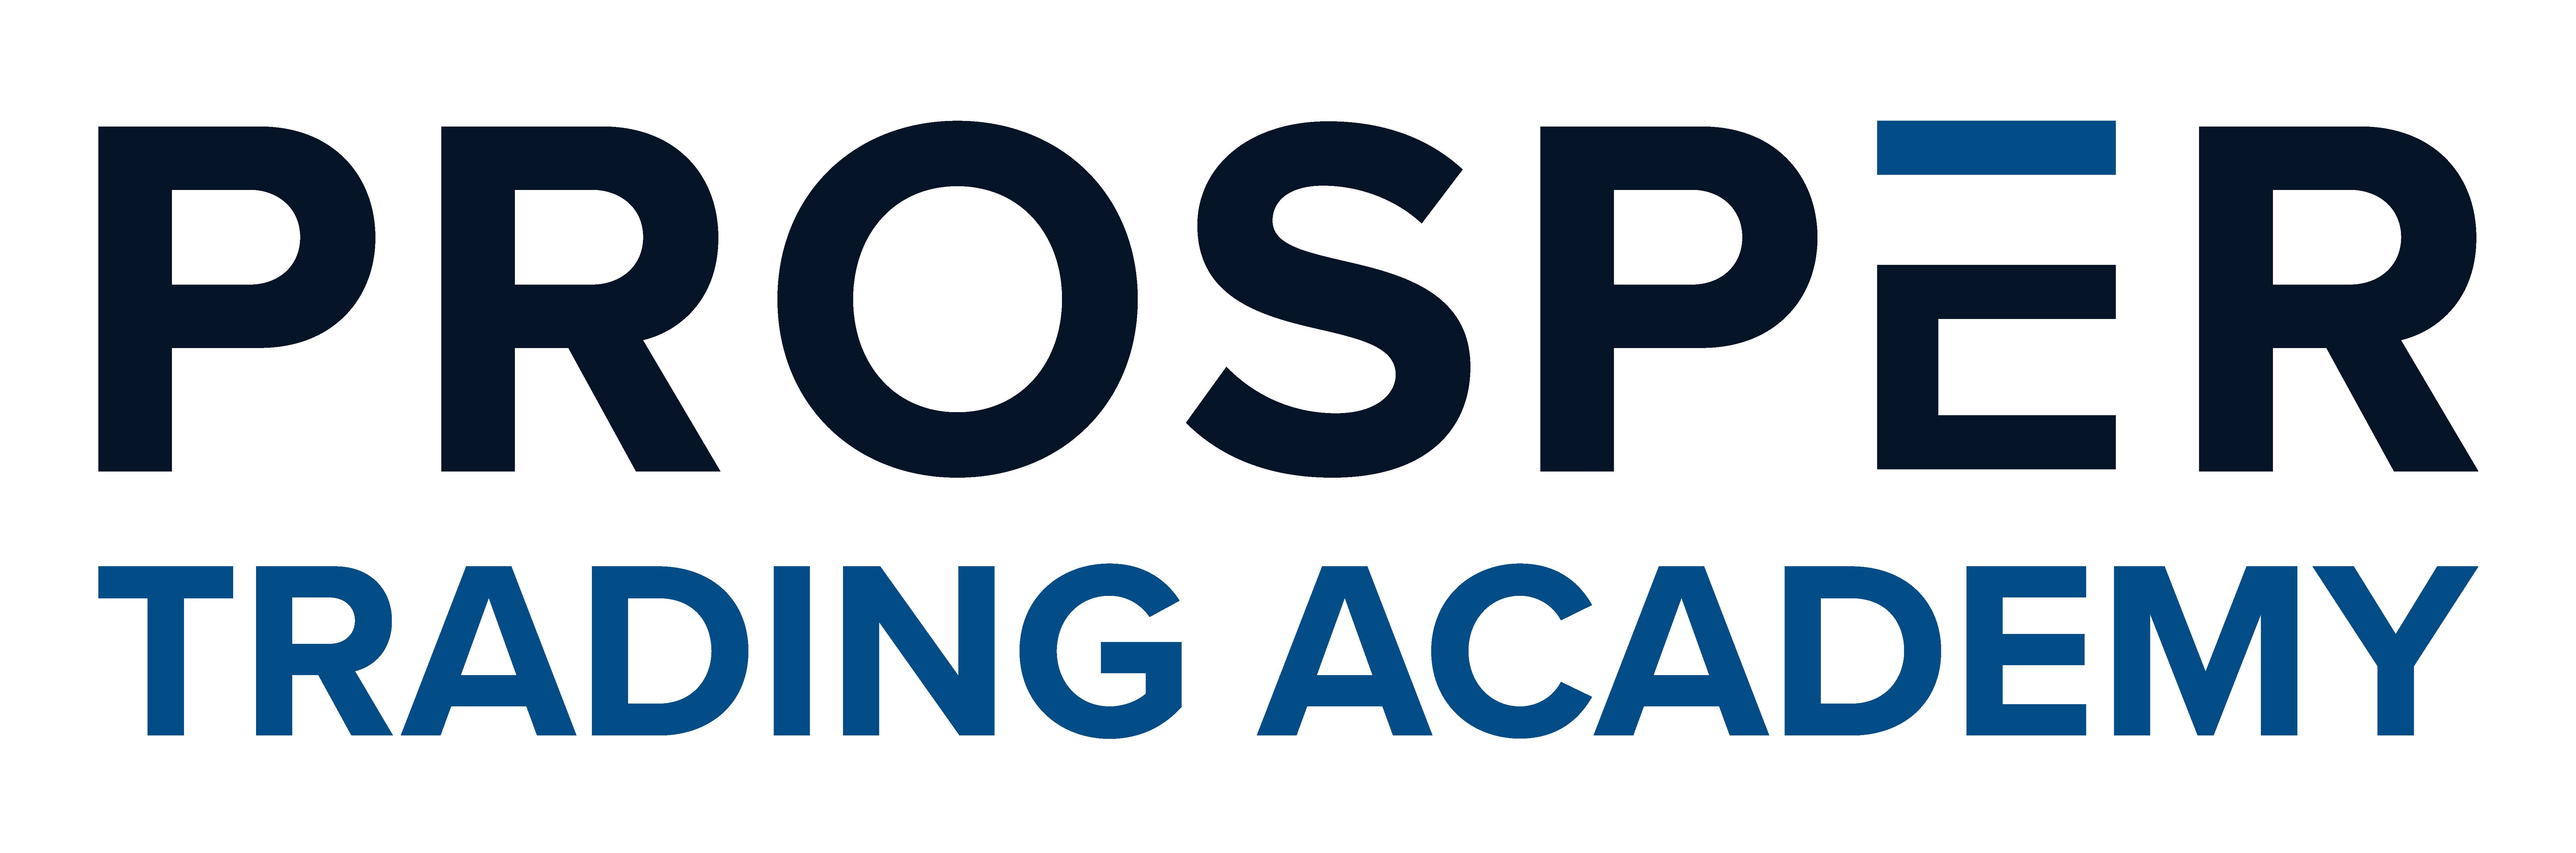 Prosper Trading Academy